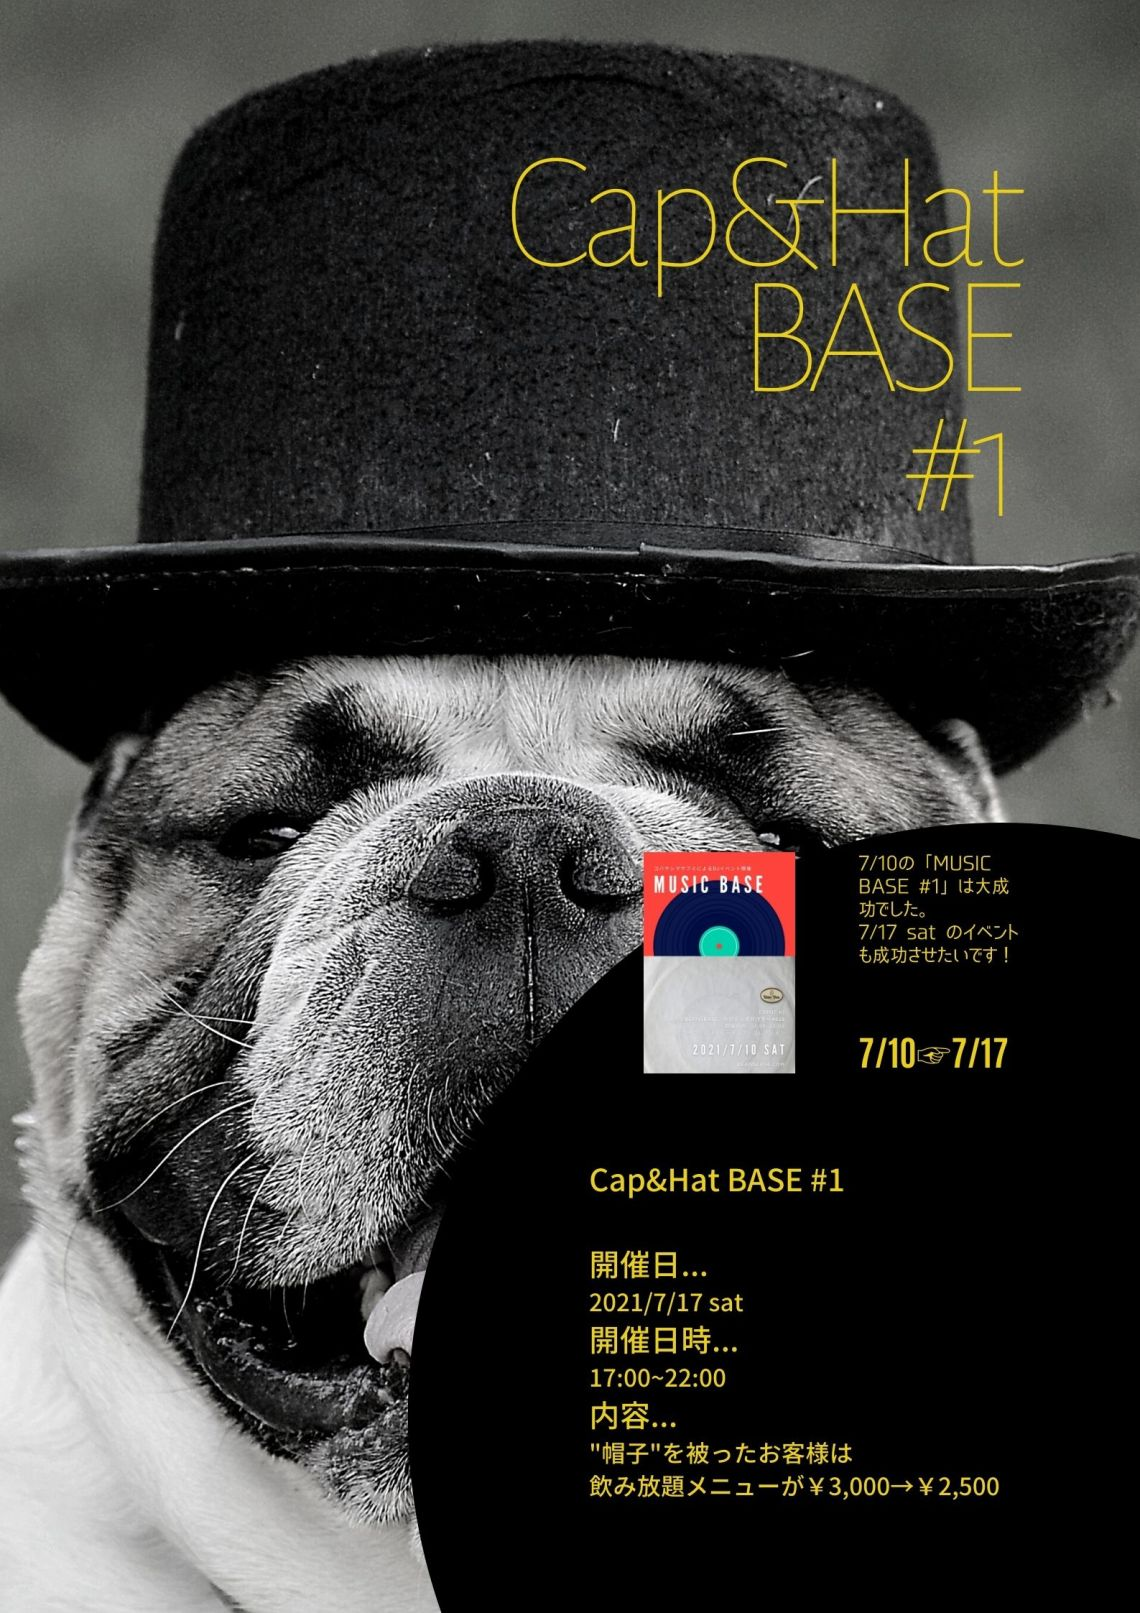 CapHatBASE